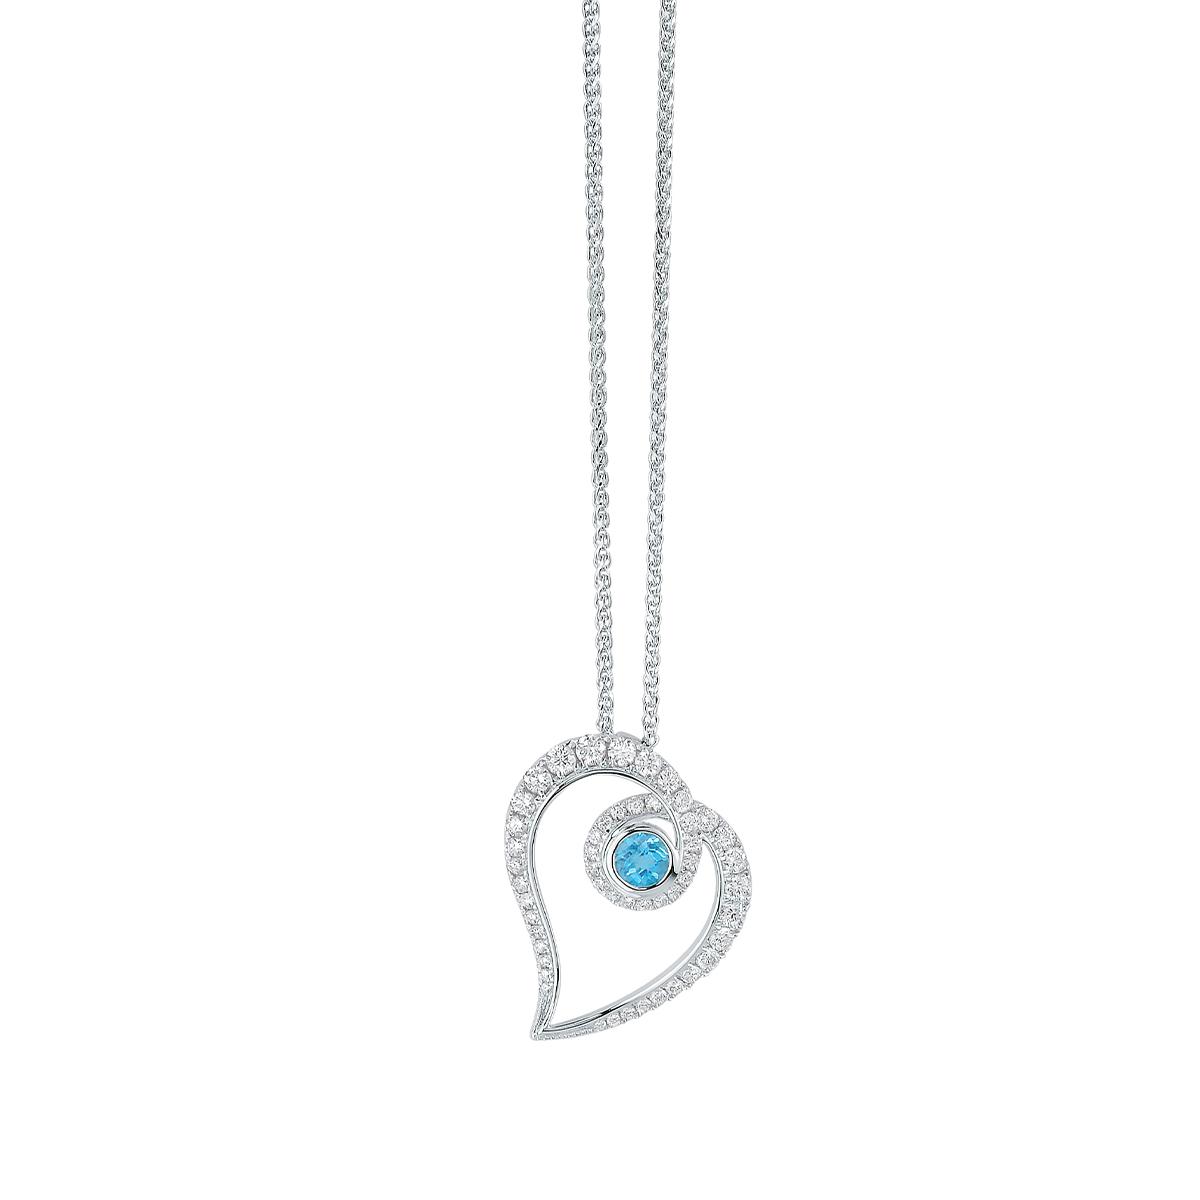 White Gold Topaz and Diamond Heart Shaped Pendant